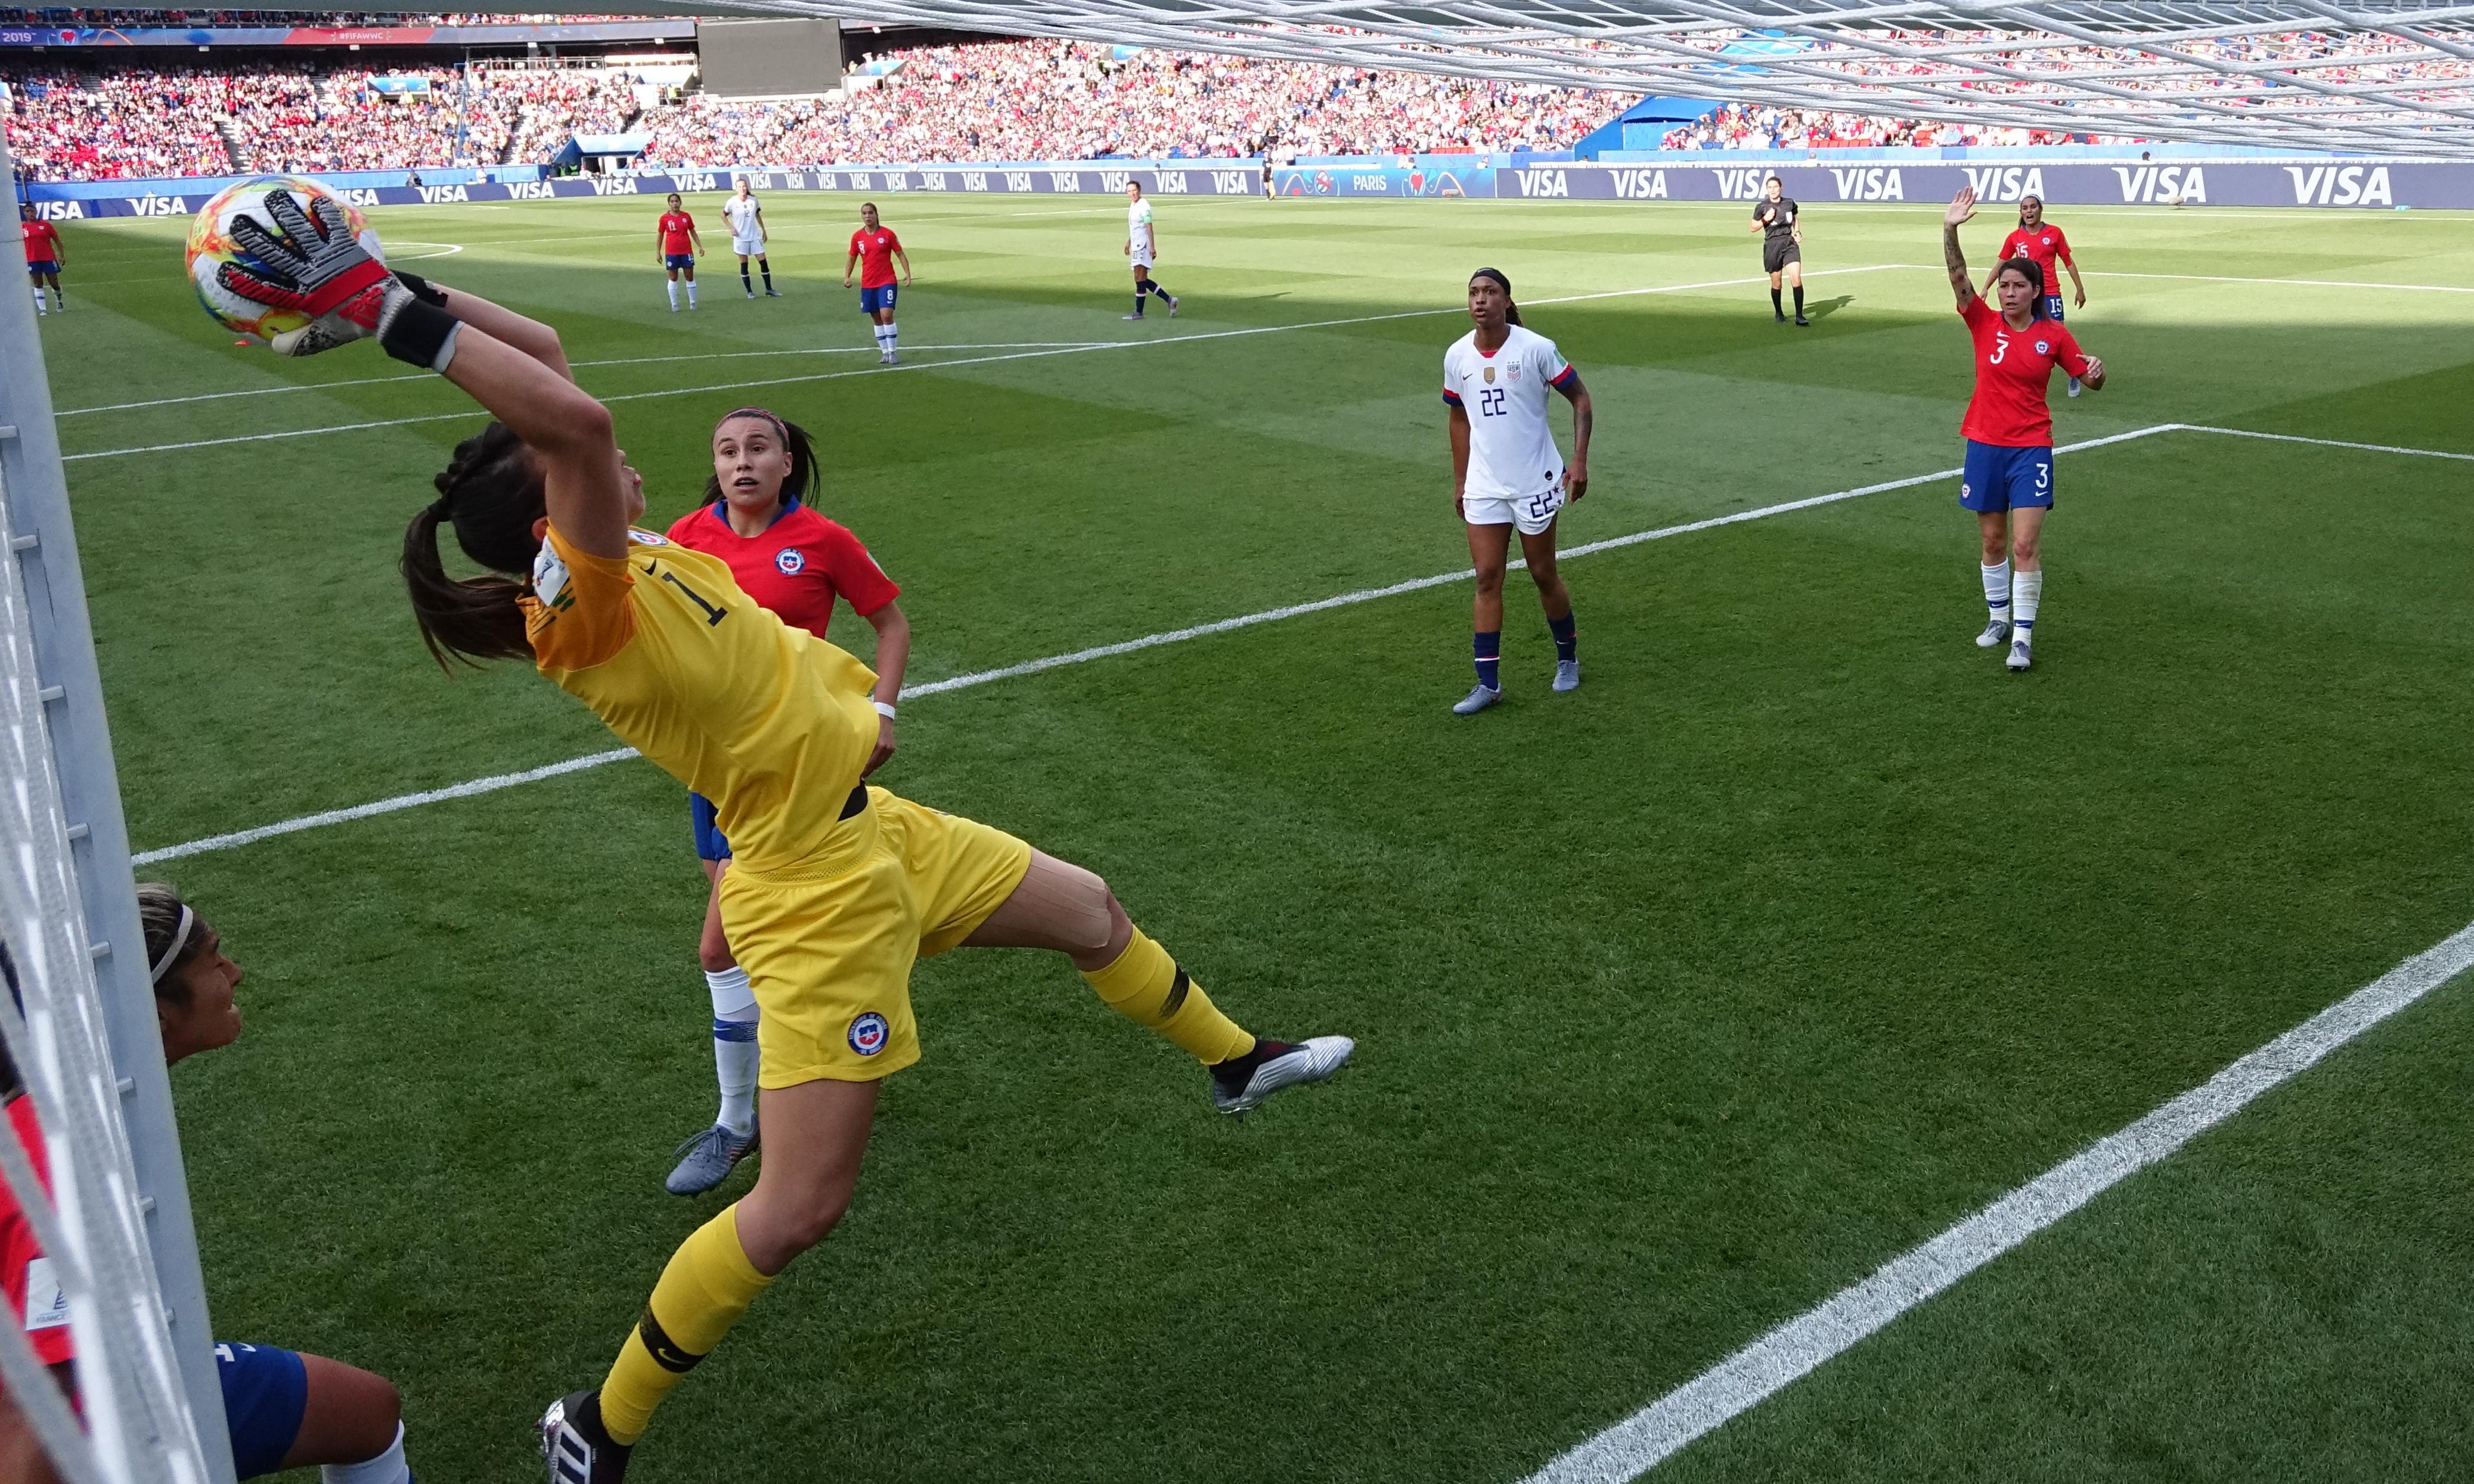 The superb Christiane Endler shows women don't need smaller goals